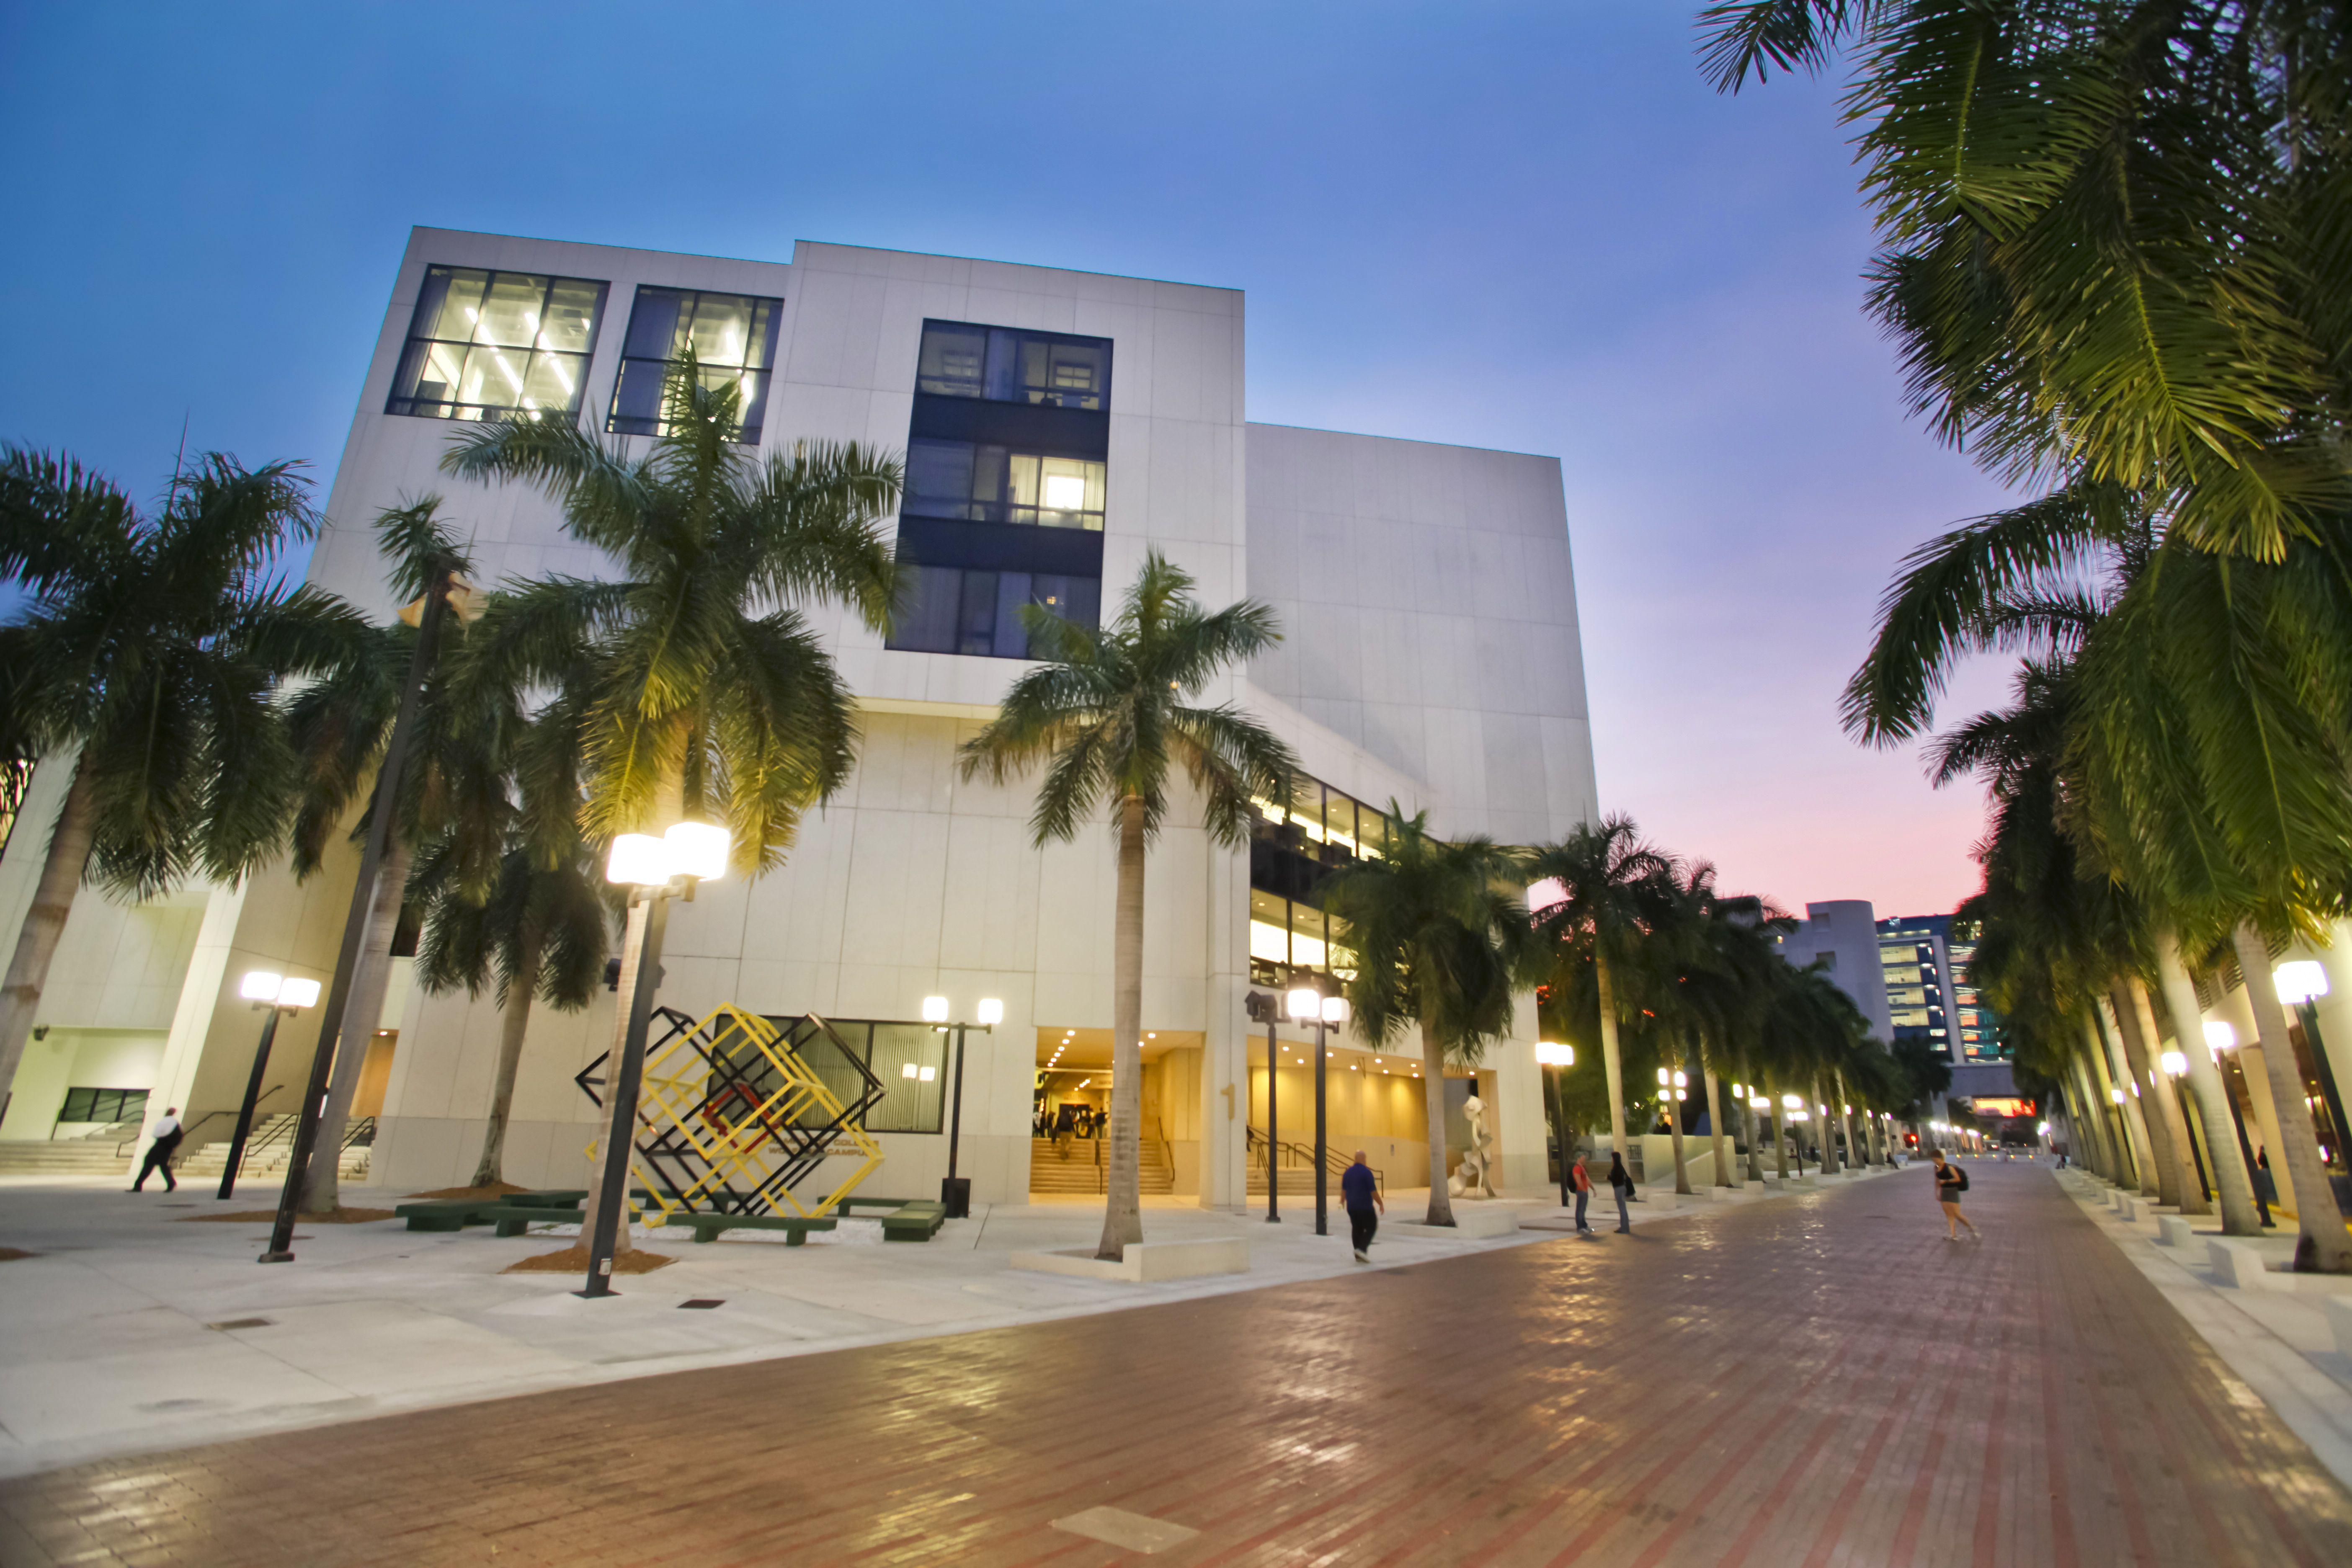 Miami Dade College Wolfson Campus Miami Dade College College Campus Career Pathways